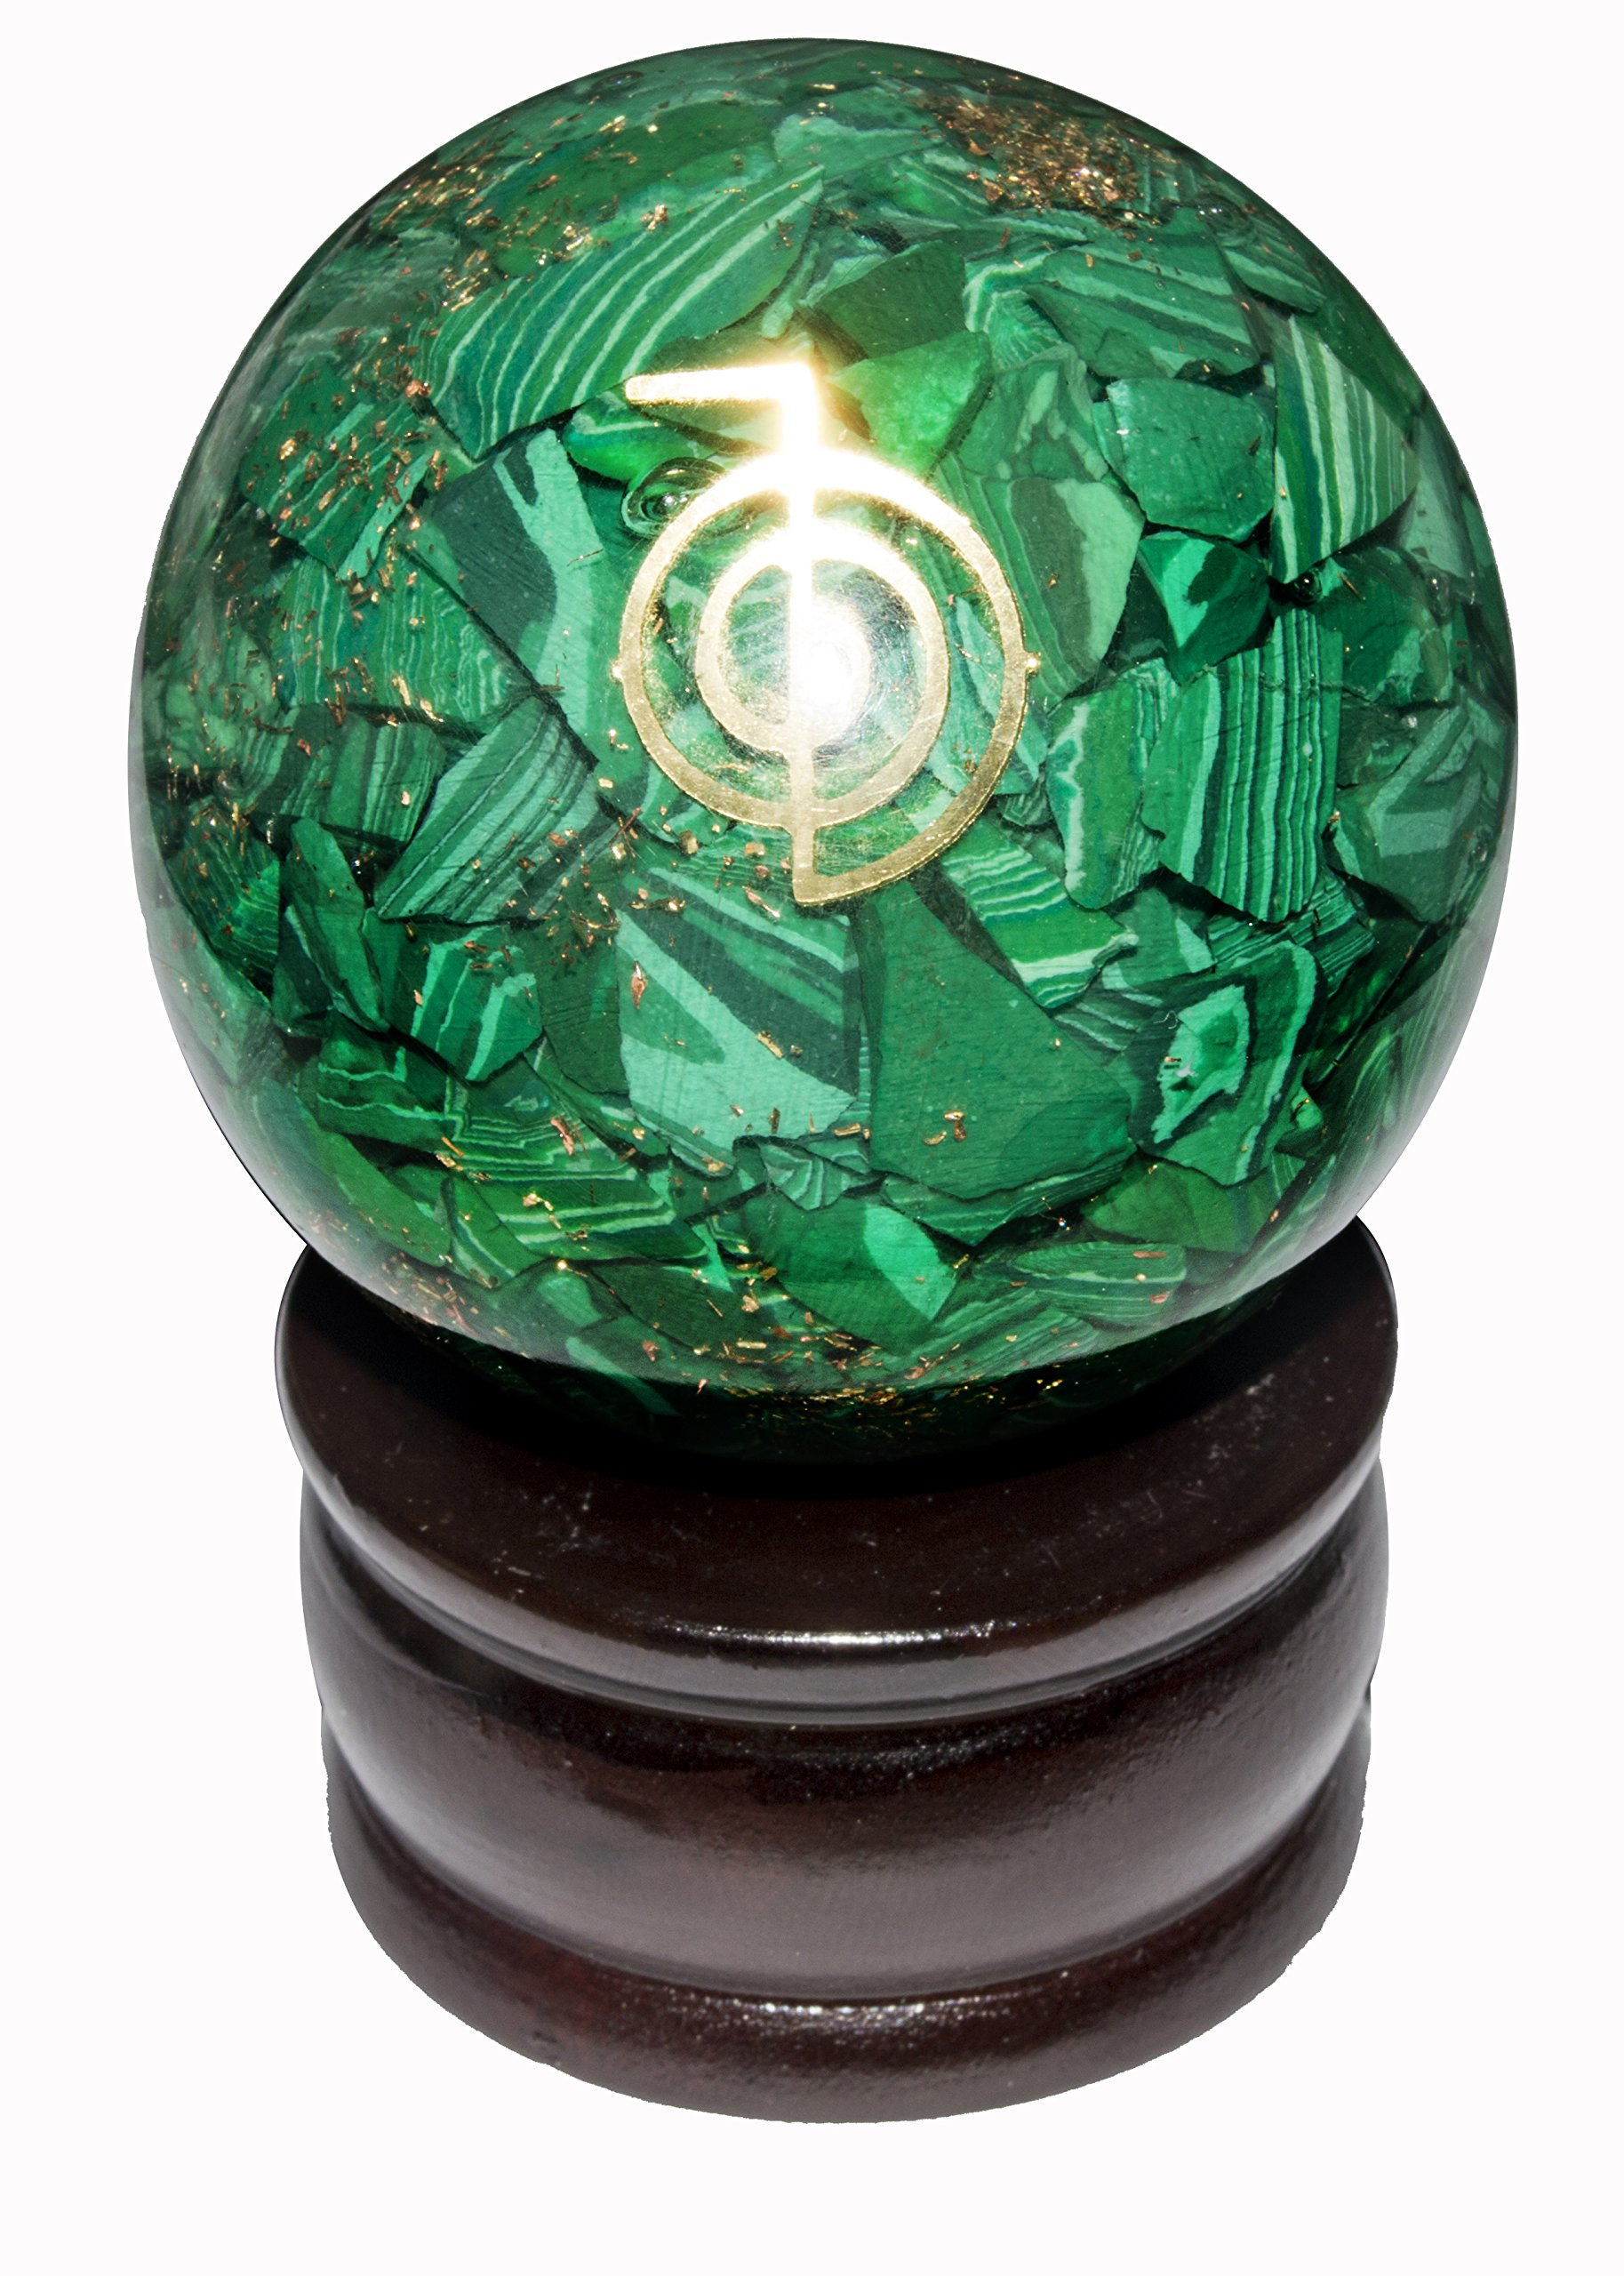 Crocon Green Malachite Orgone Sphere Ball Cho Ku Rei Symbol Energy Generator for Reiki Healing Chakra Balancing & EMF Protection Size: 50-60mm